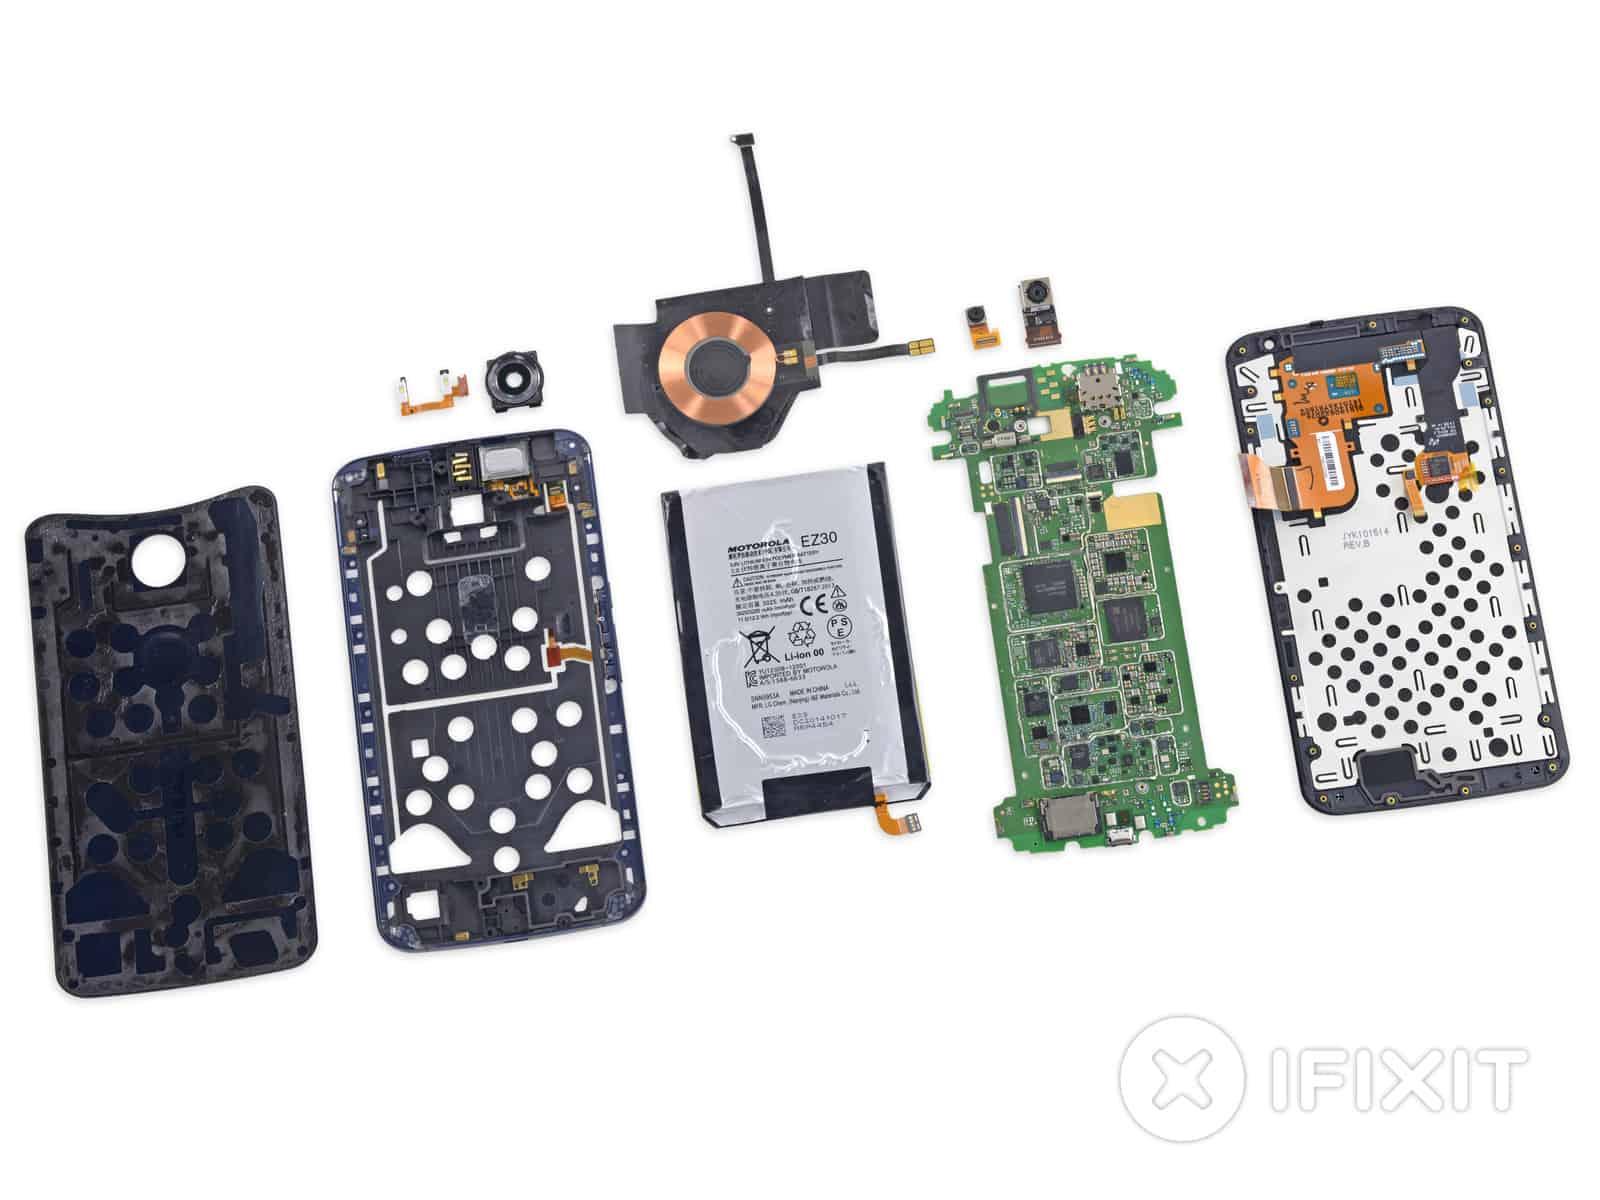 Nexus 6 iFixit teardown 14